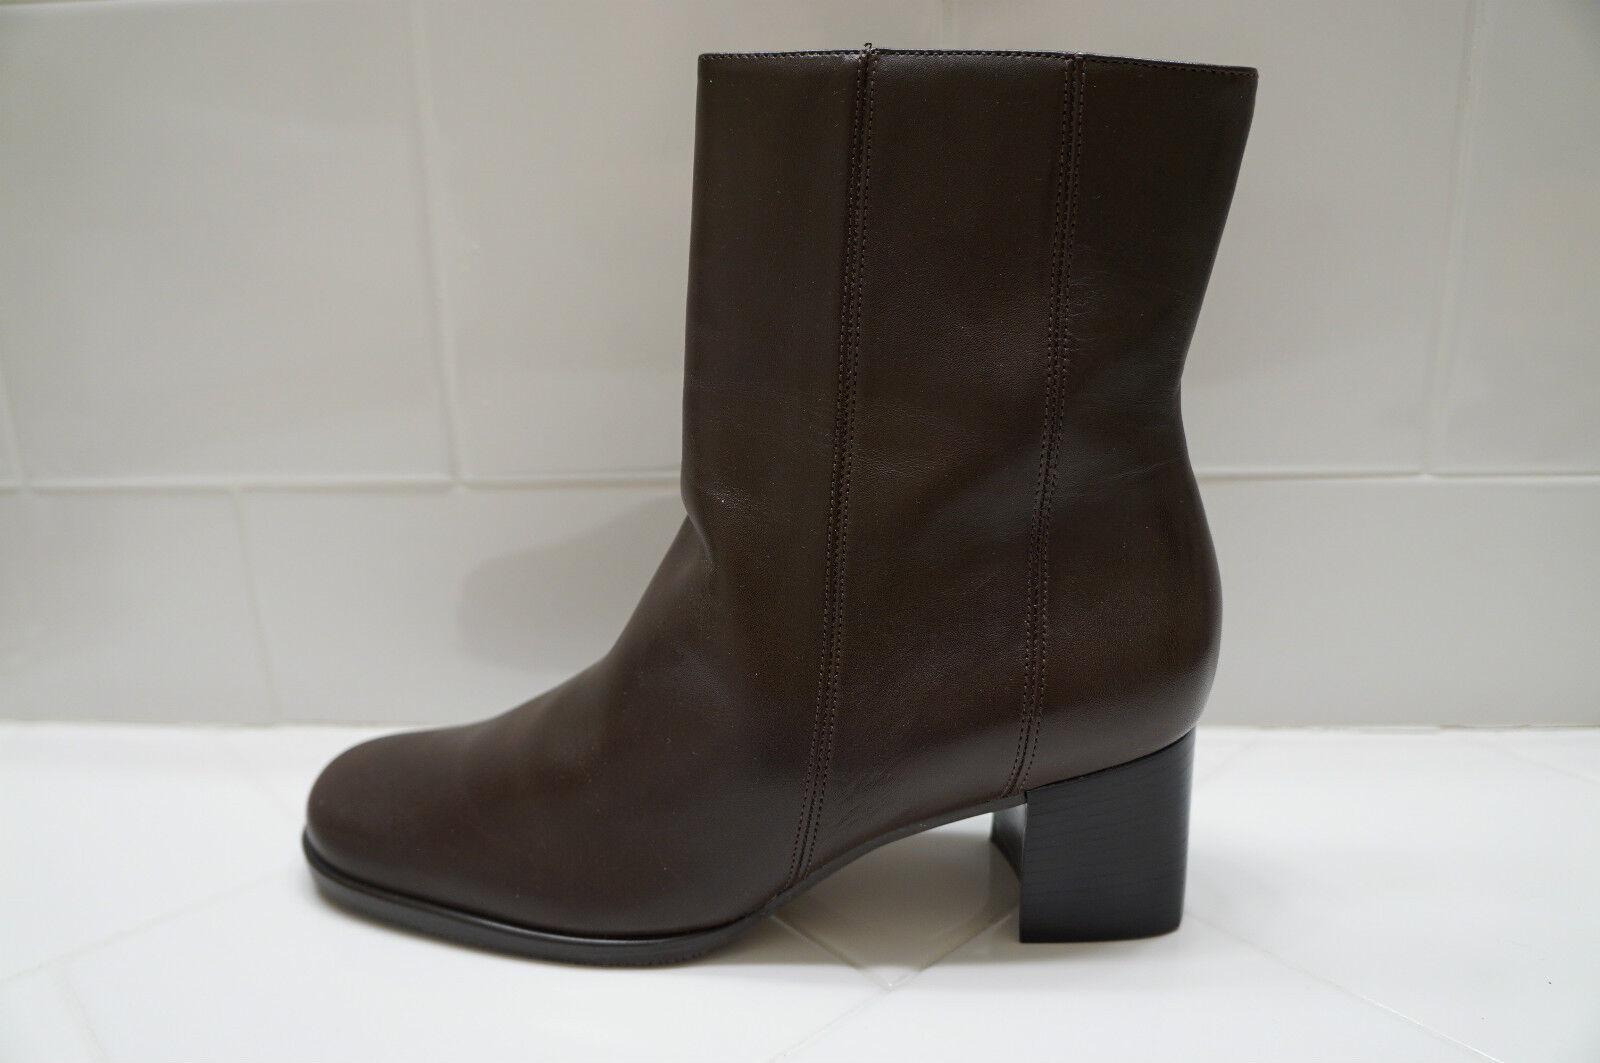 Easy Spirit Boots   Womens 7 1 2 M   Brown   NIB    Retail price